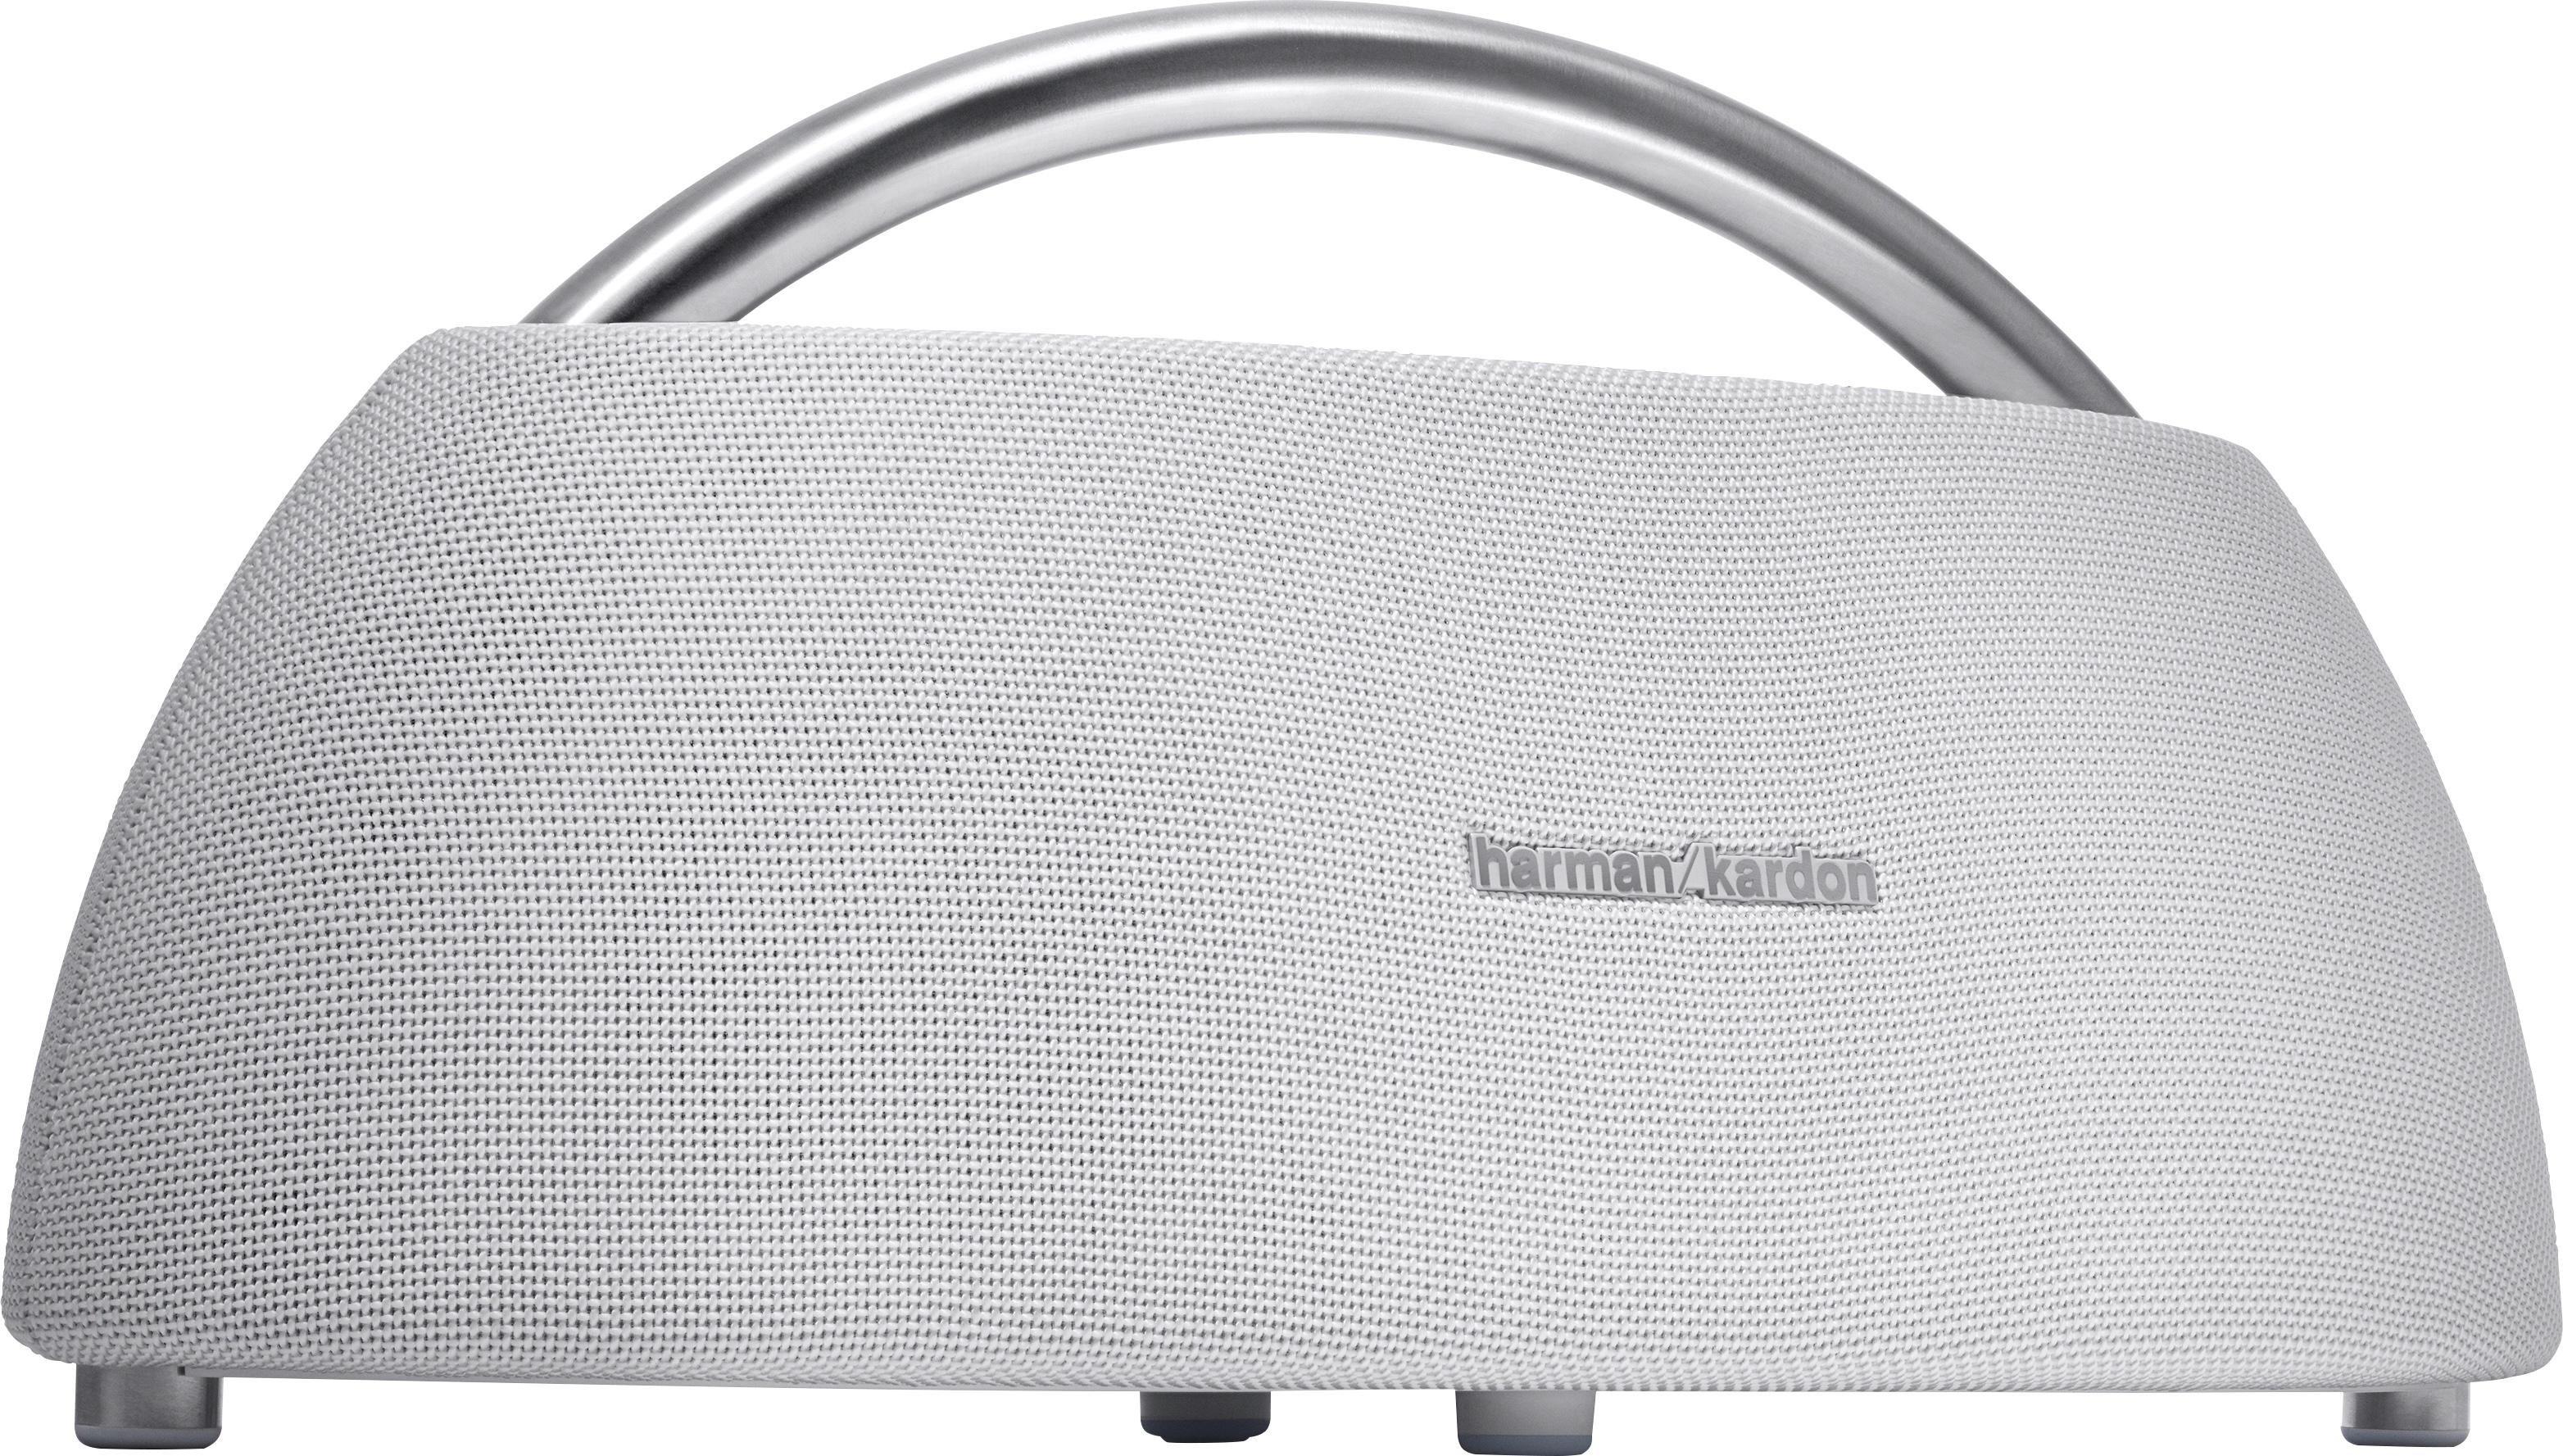 Harman/kardon Go + Play Bluetooth-luidspreker, USB in de webshop van OTTO kopen